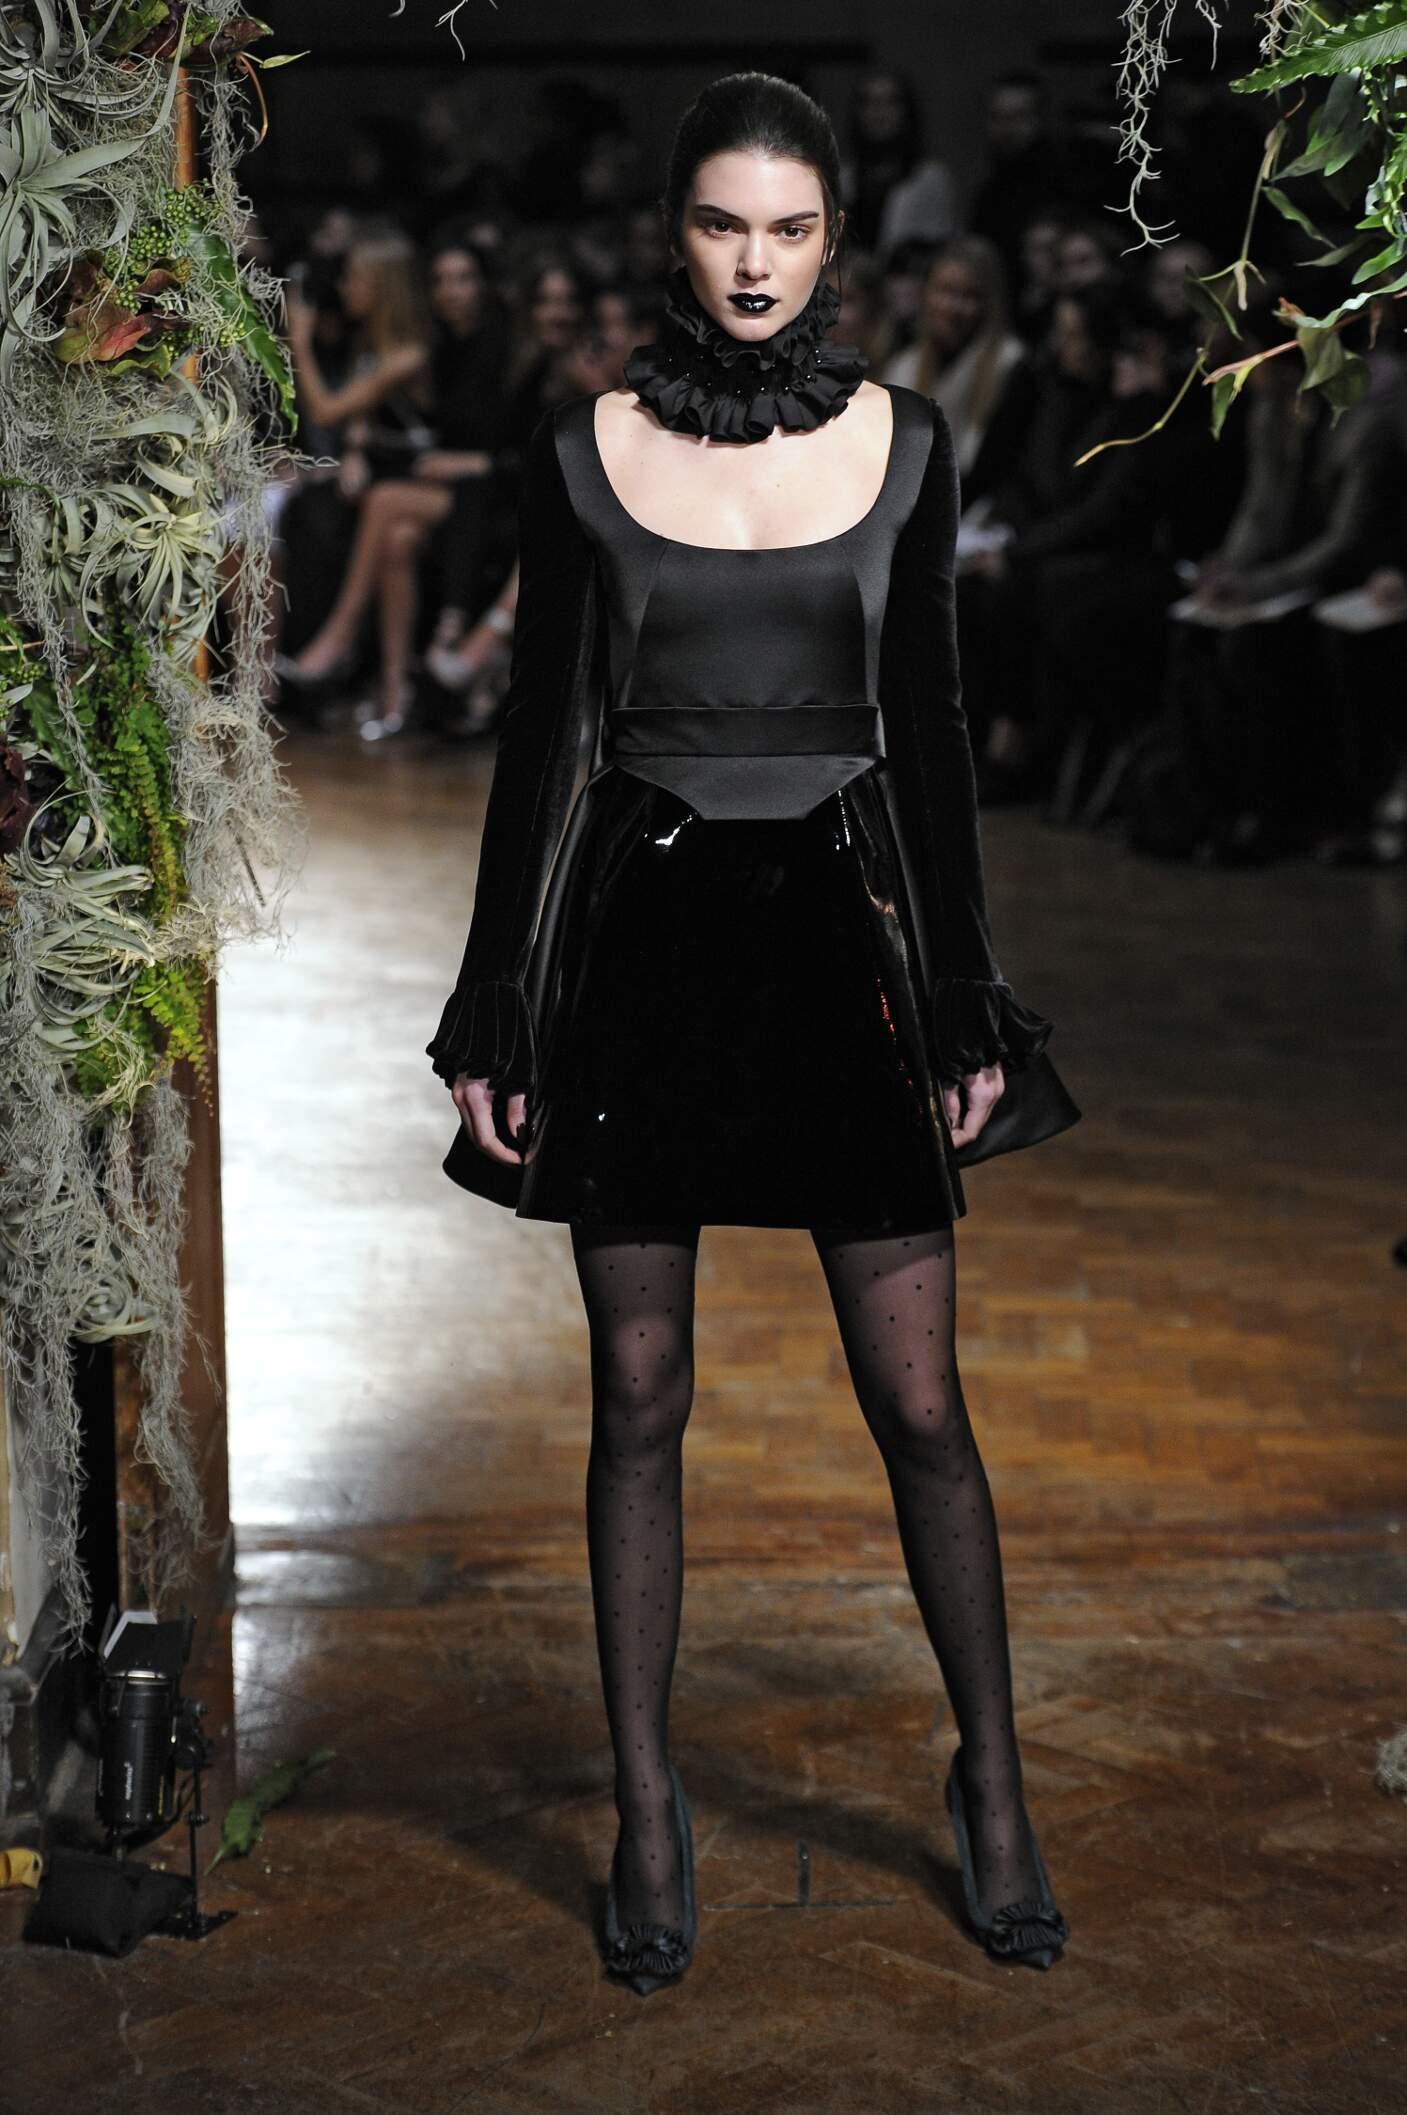 Foto de Kendall jenner en las Semanas de la Moda (4/17)